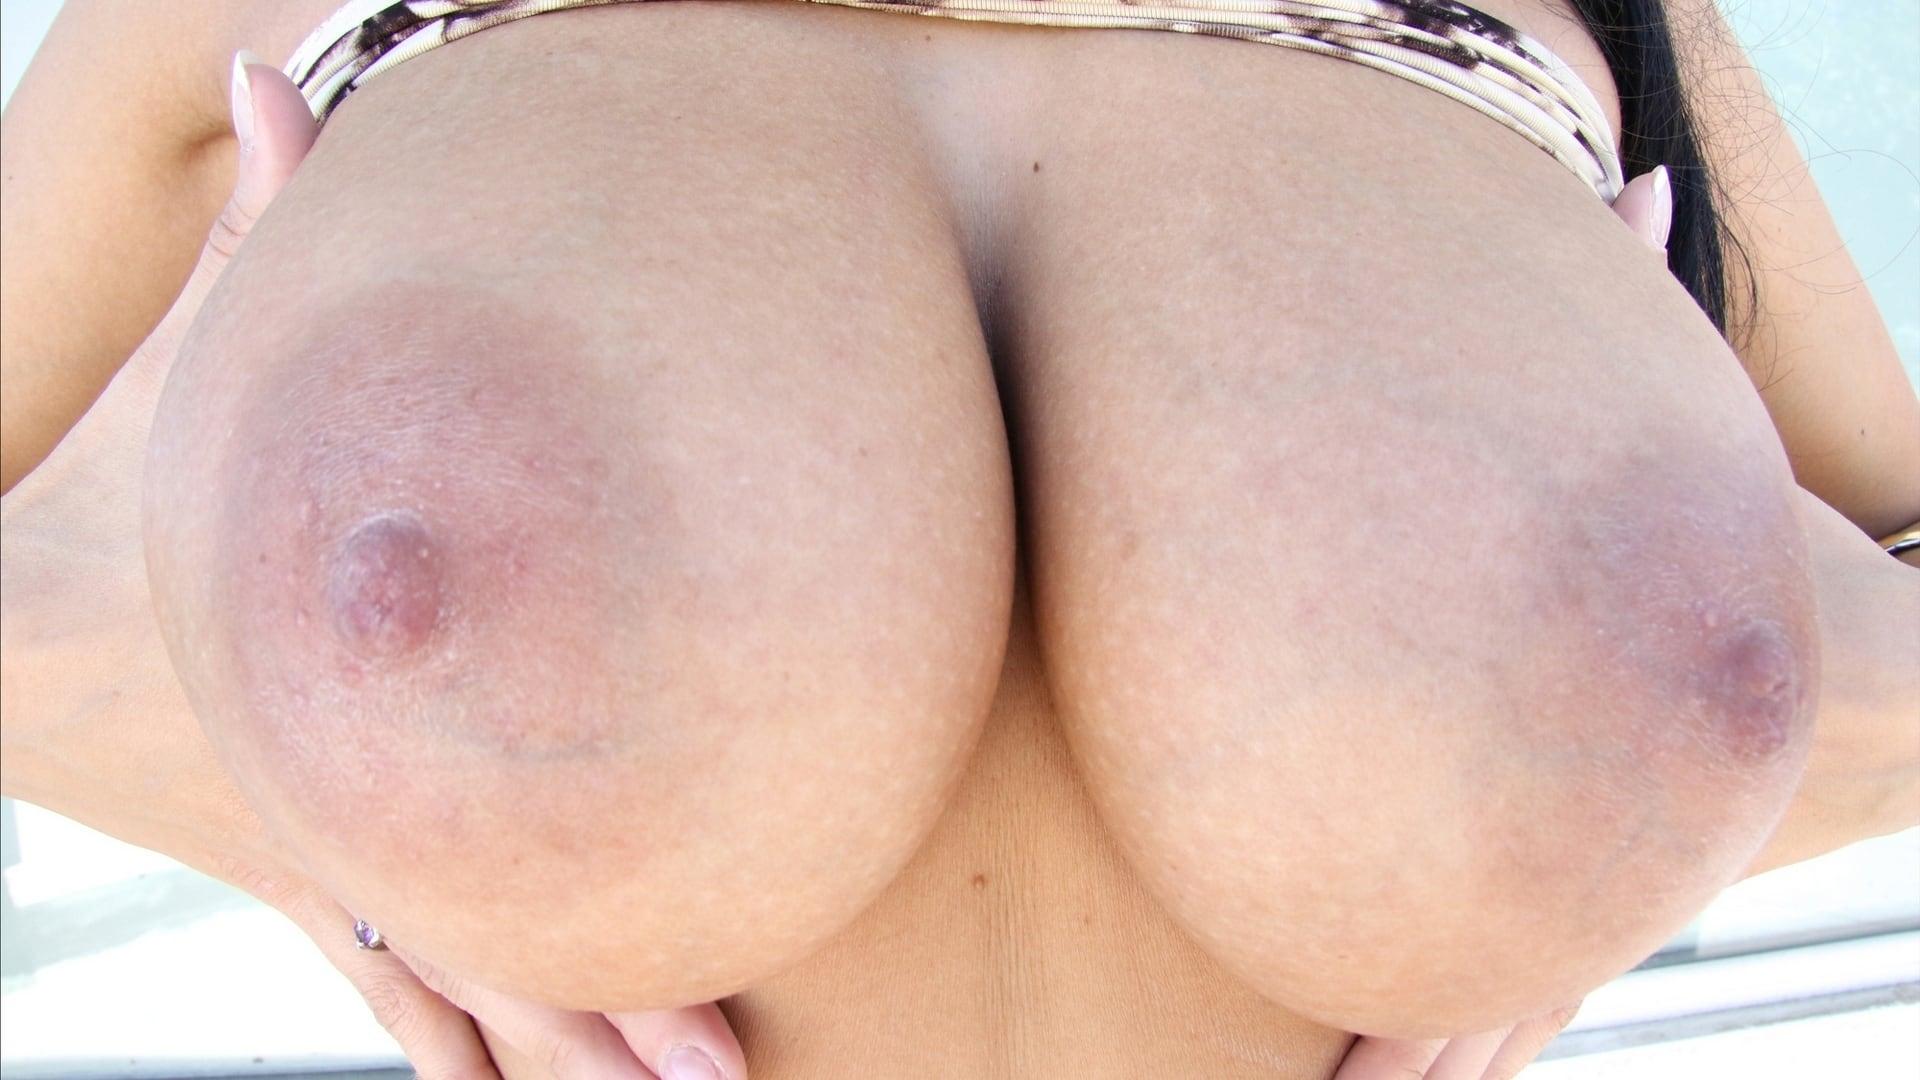 japan-artis-big-tits-round-arse-facial-sunspots-petite